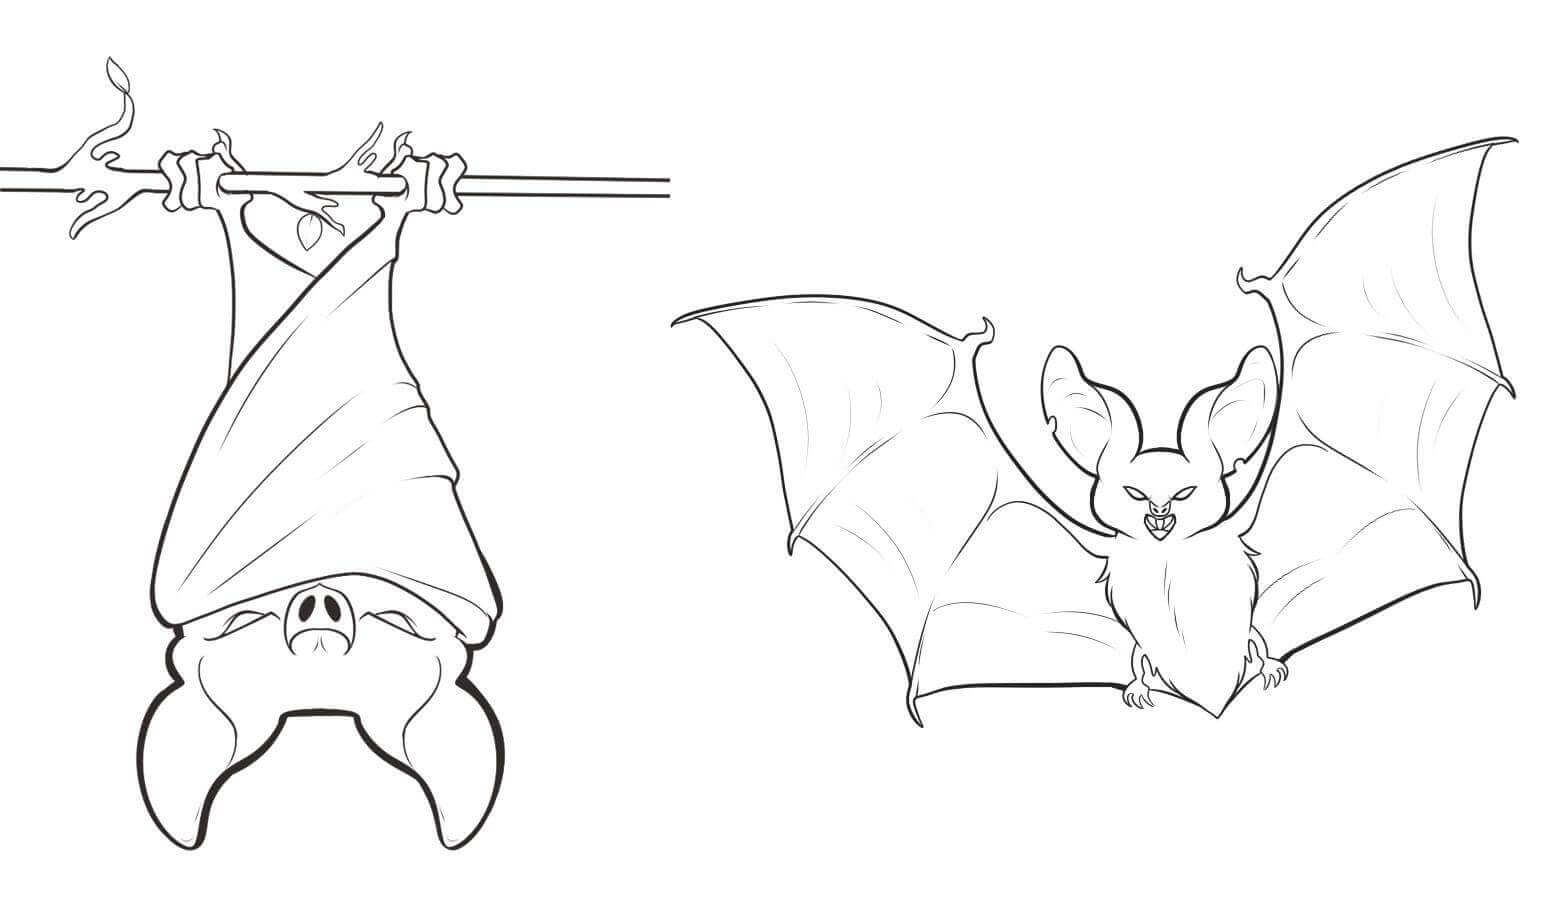 Bat Hanging Upside Down Coloring Page.